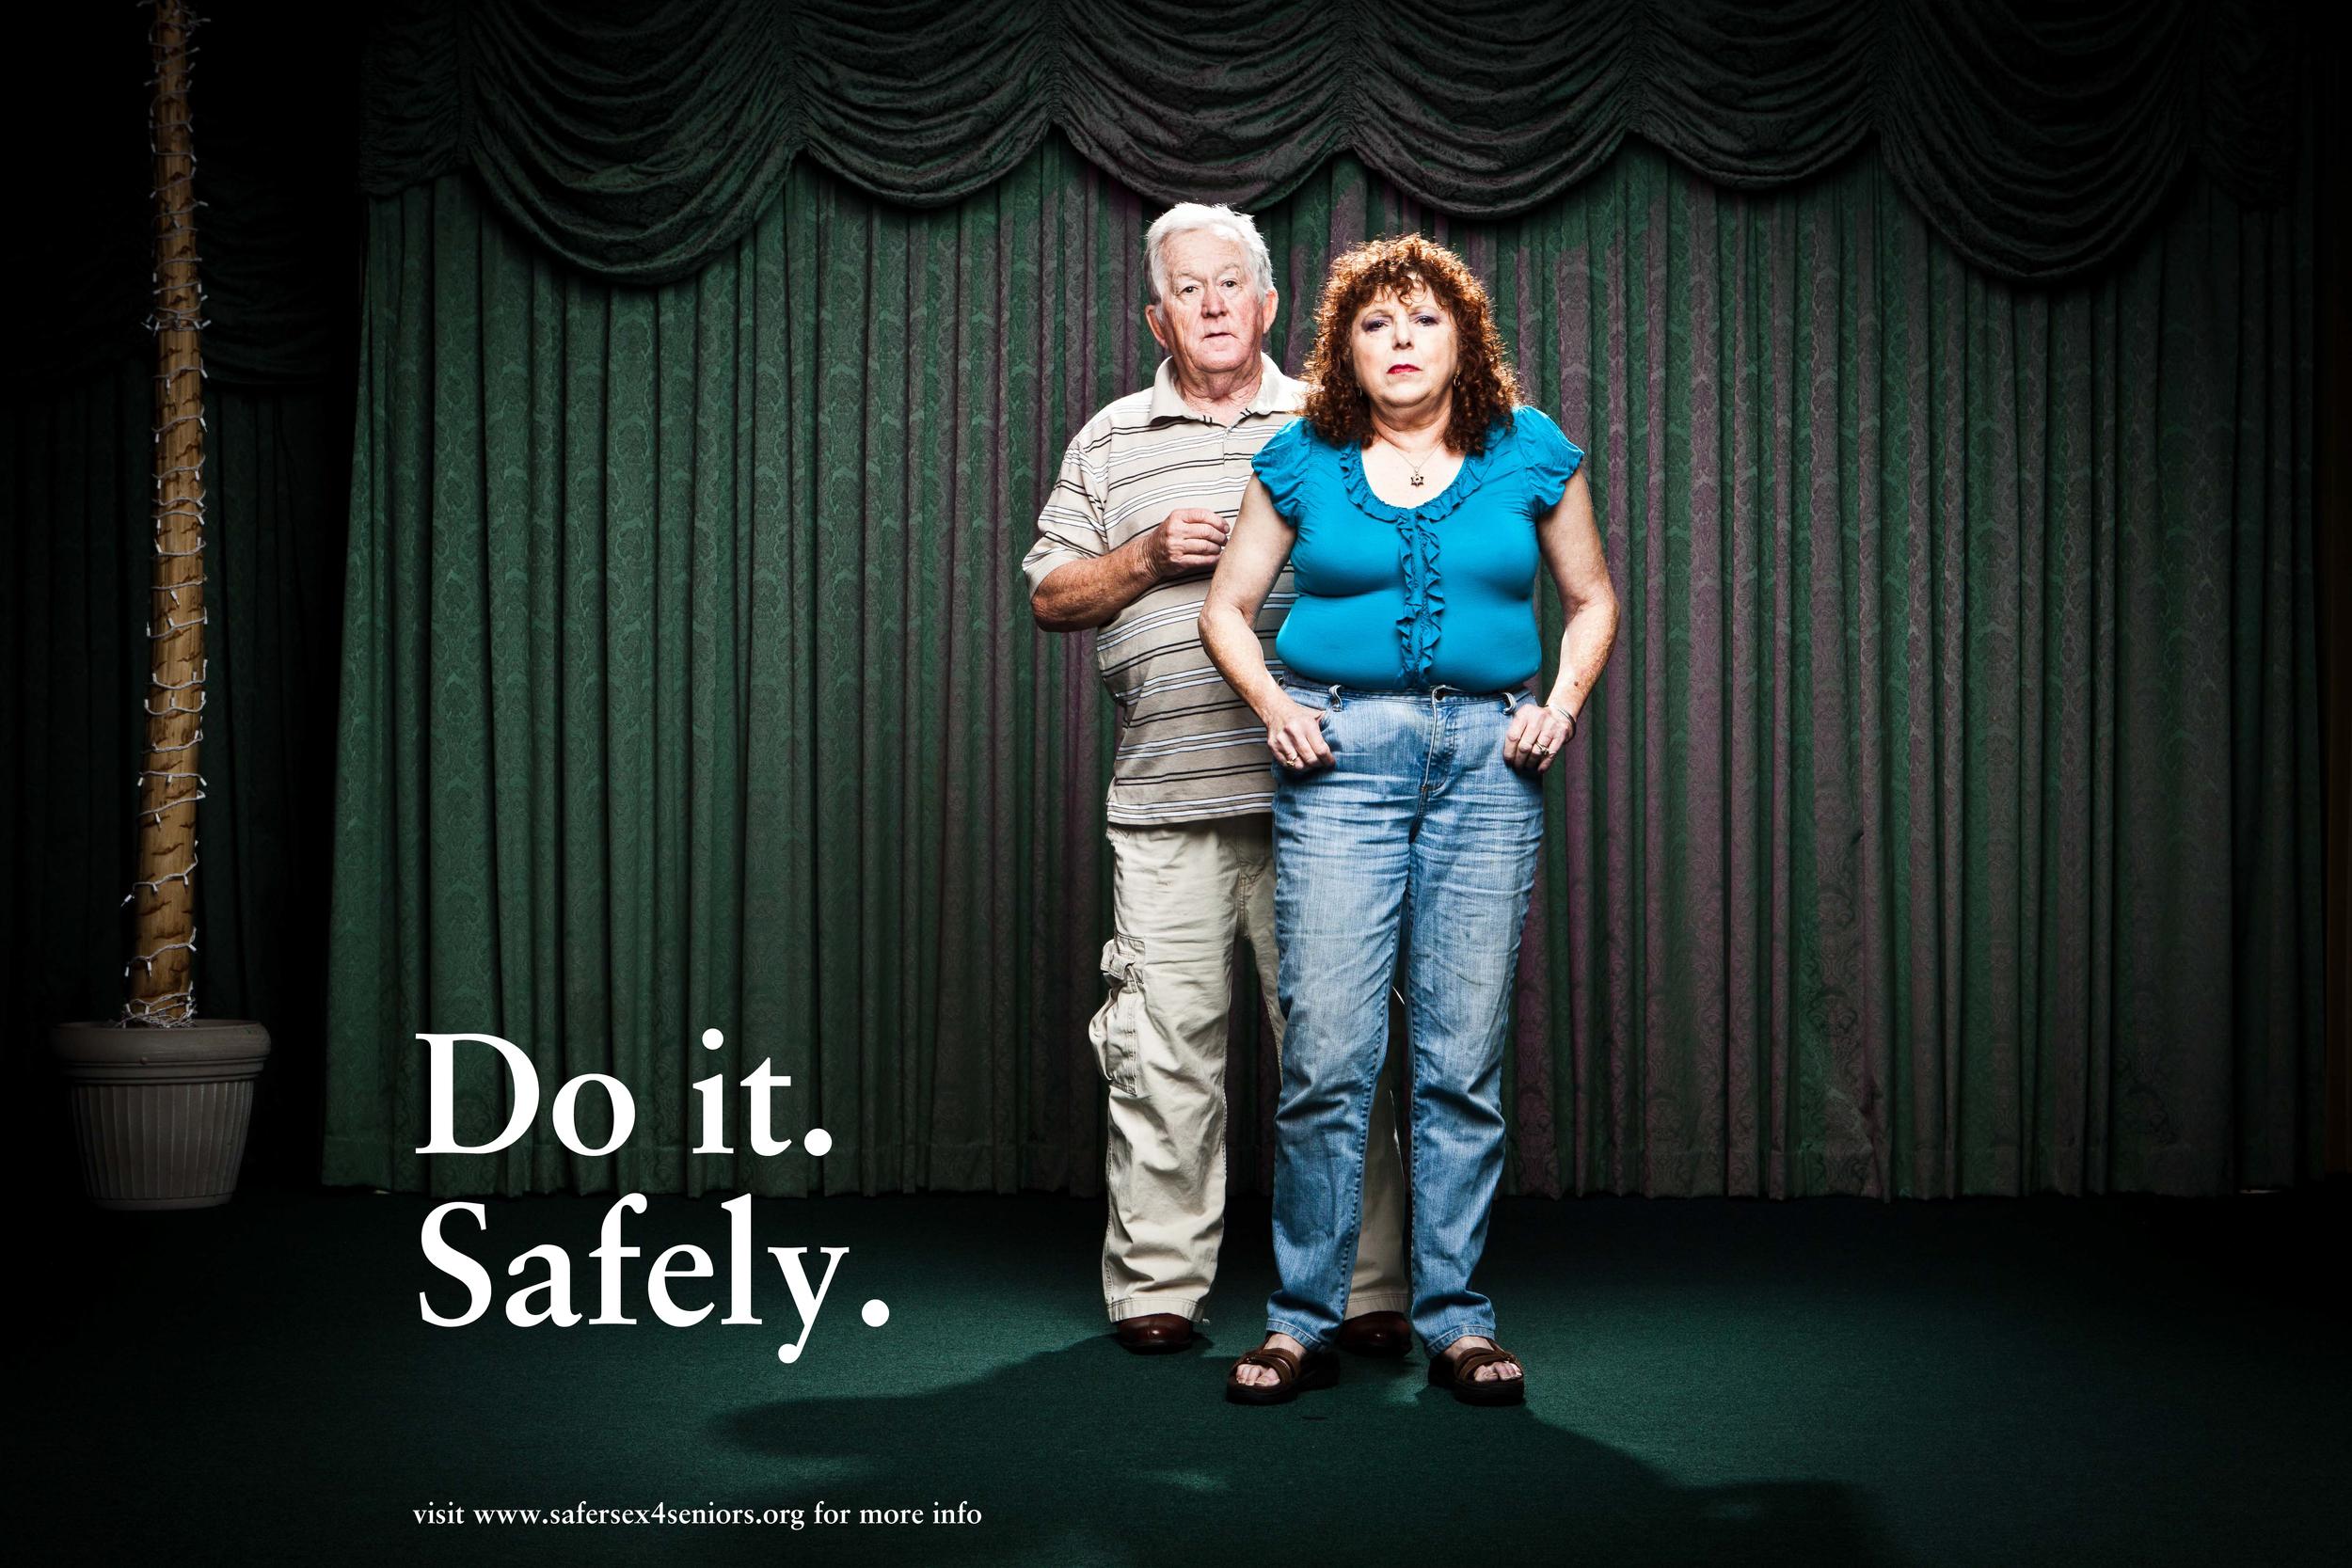 safersexfoeseniors1.jpg